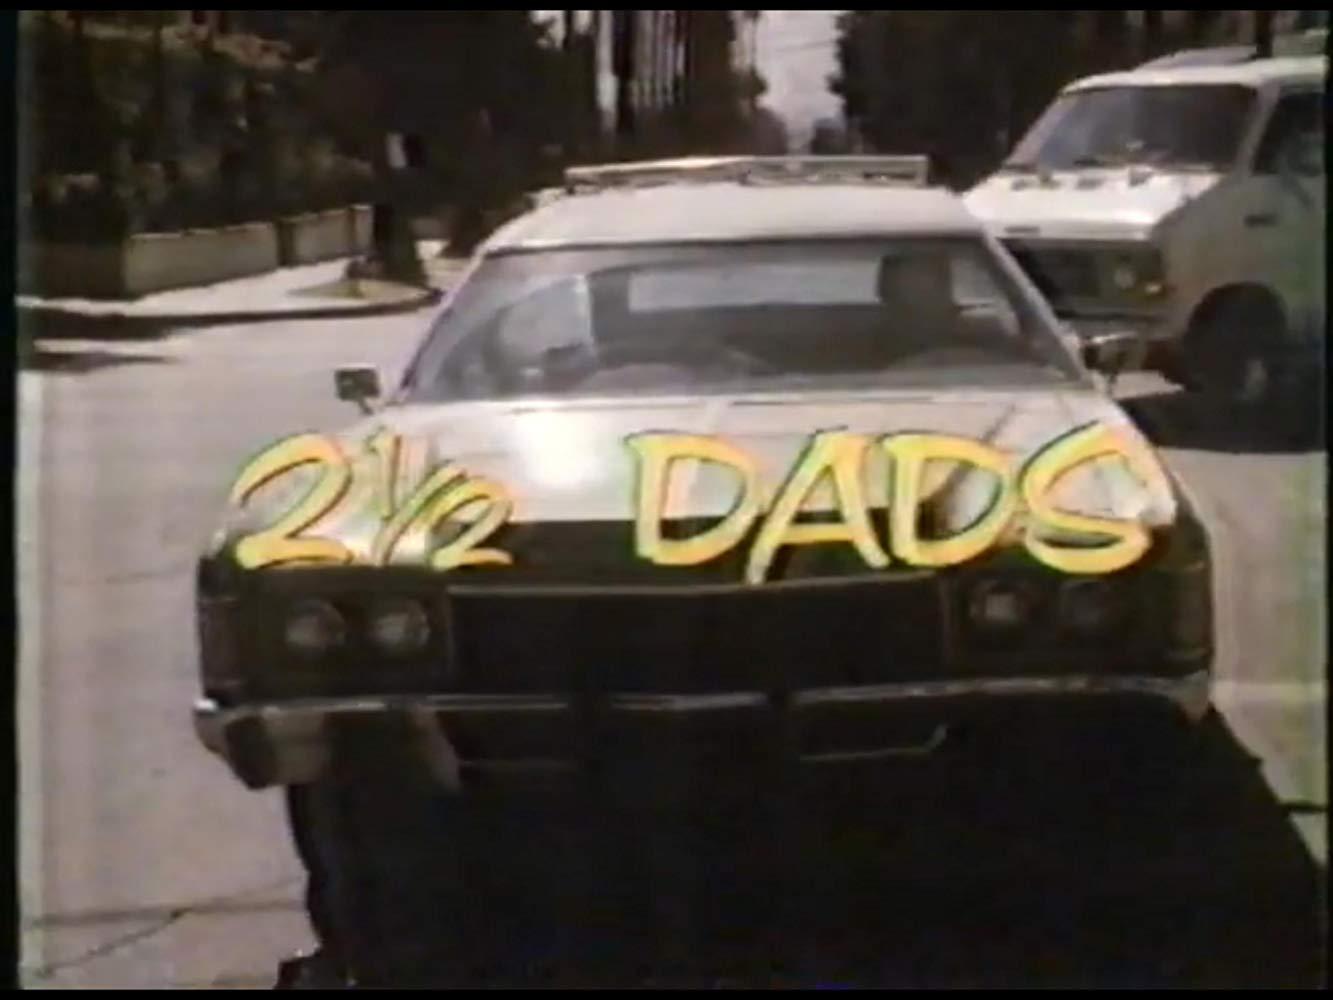 2-½ Dads